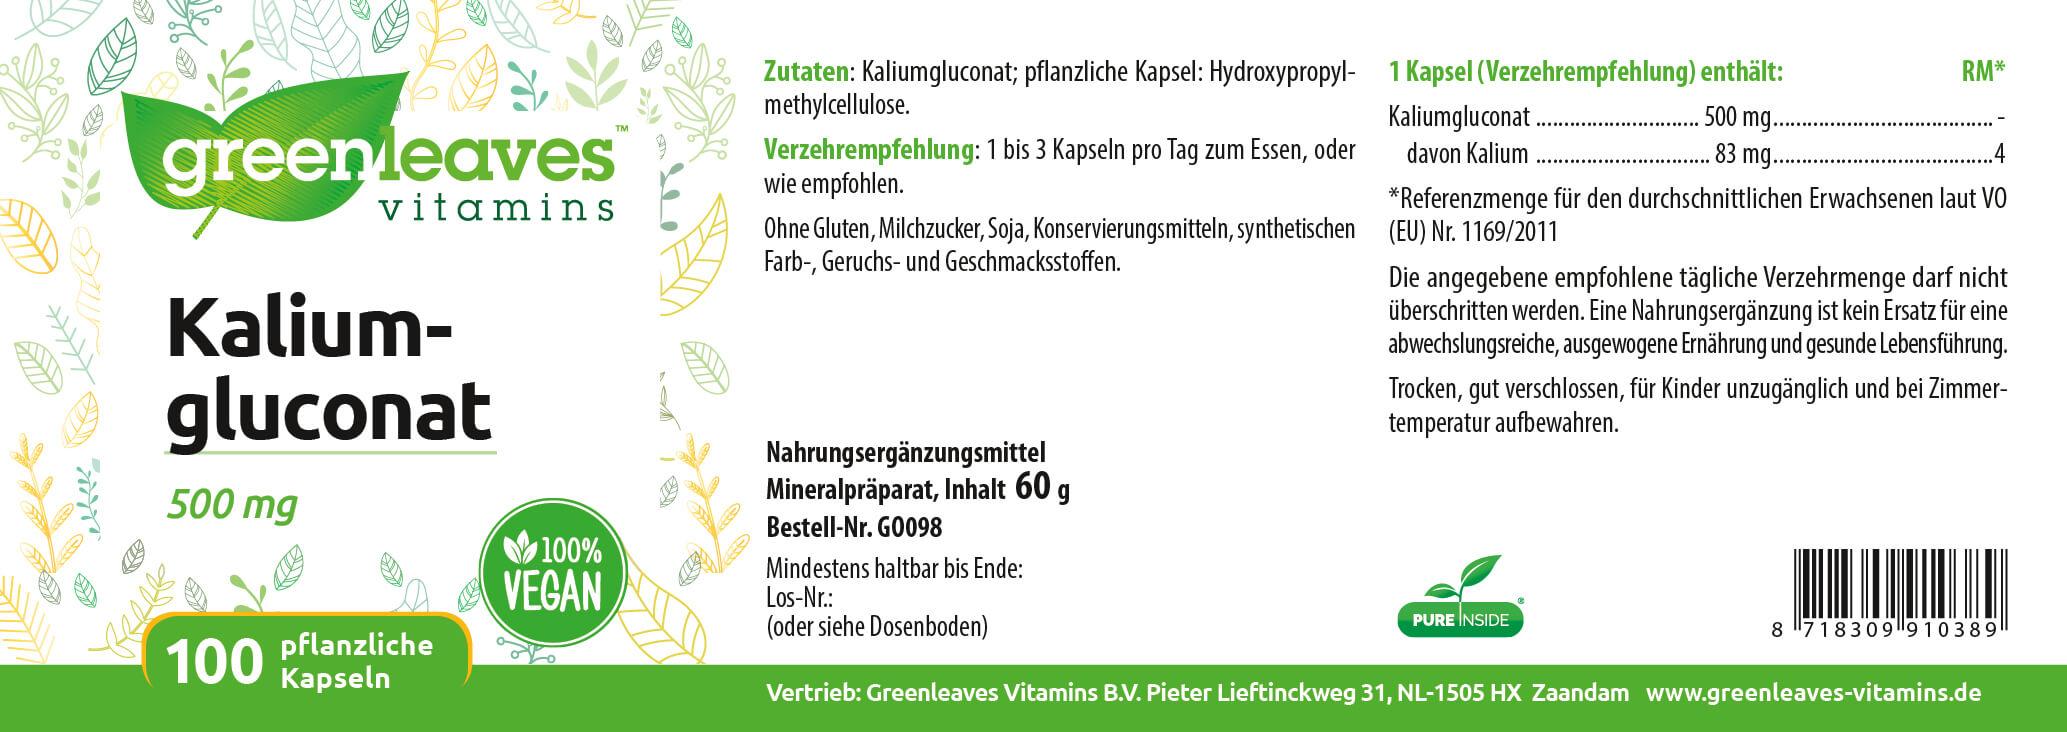 GO098-Kaliumgluconatsaje1edlU1SJX